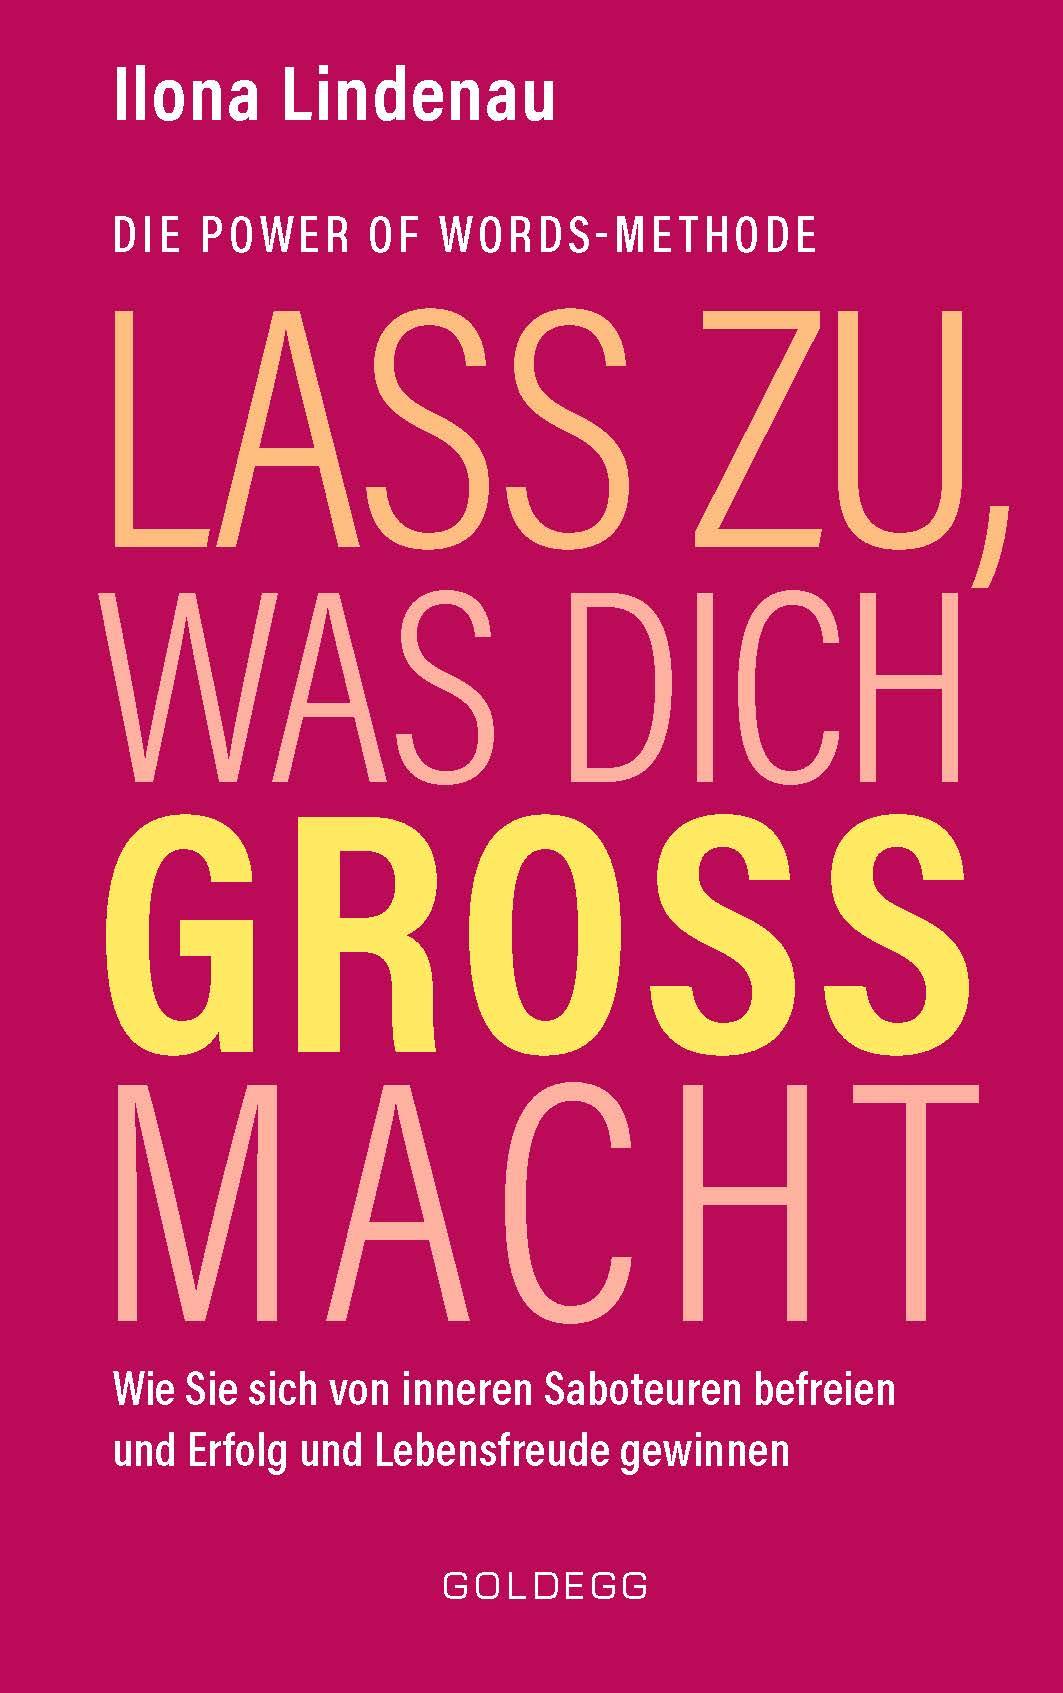 goldegg_lasszu_flat_print